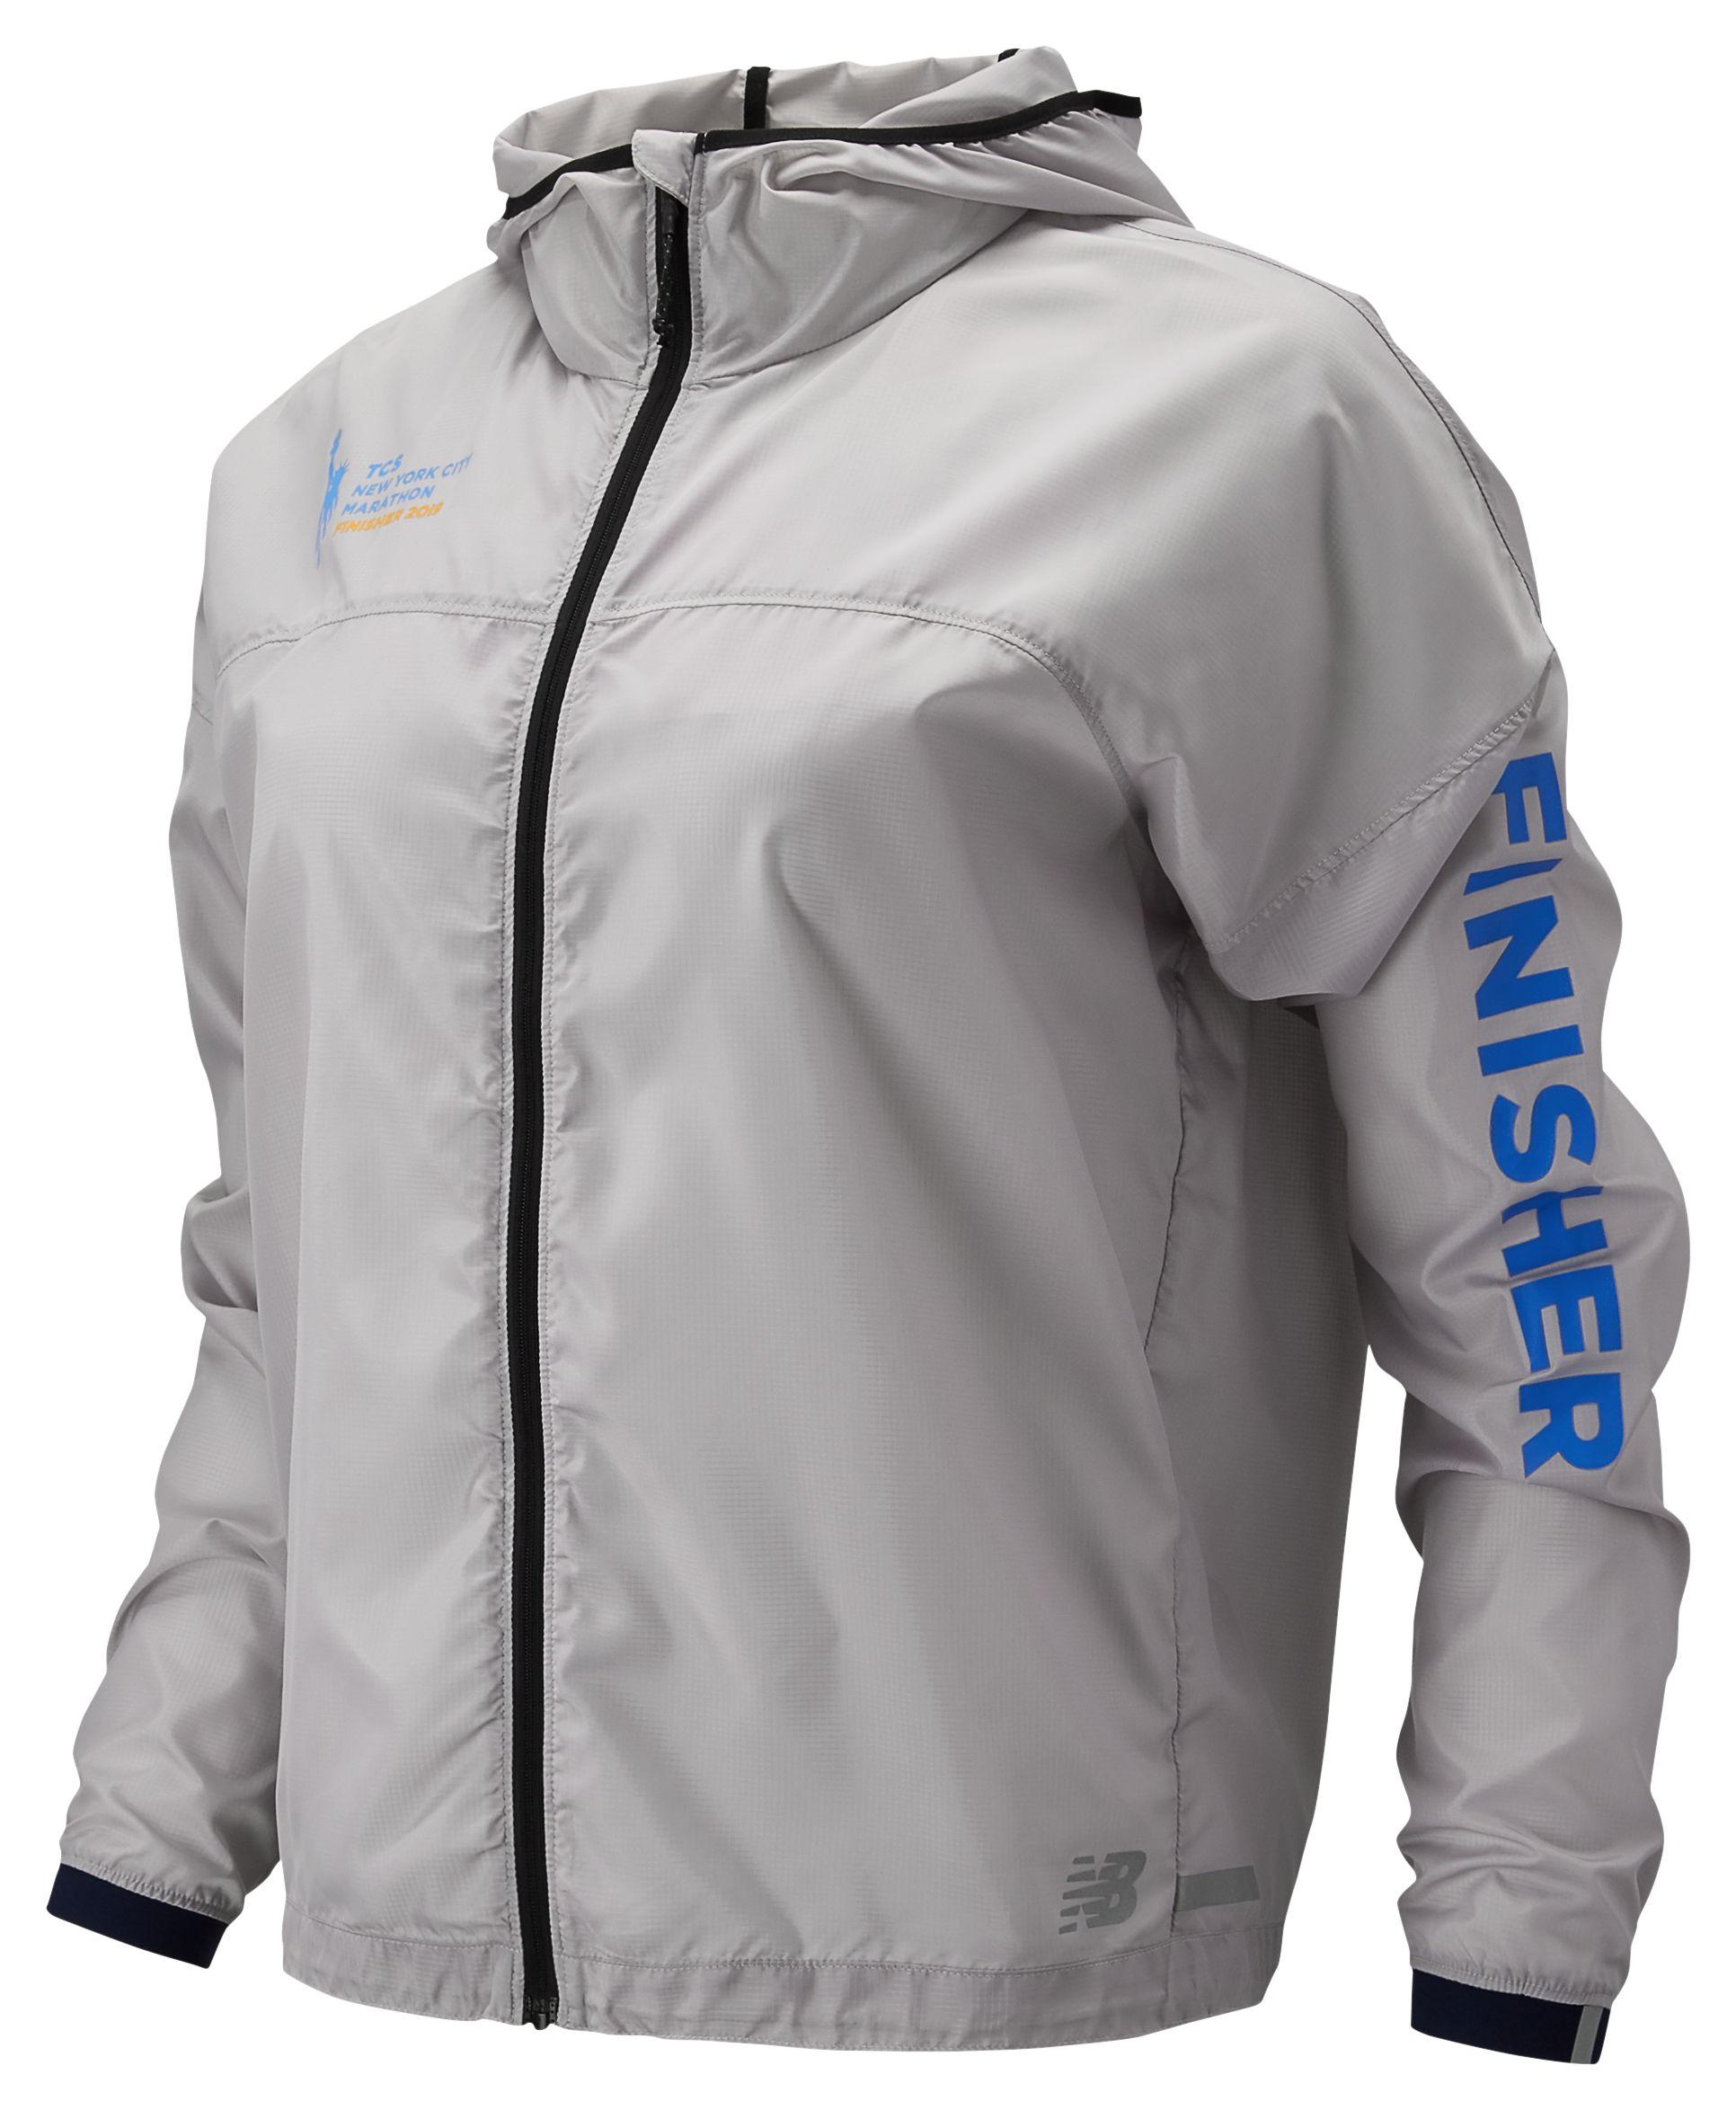 Women's 2019 NYC Marathon Light Packjacket